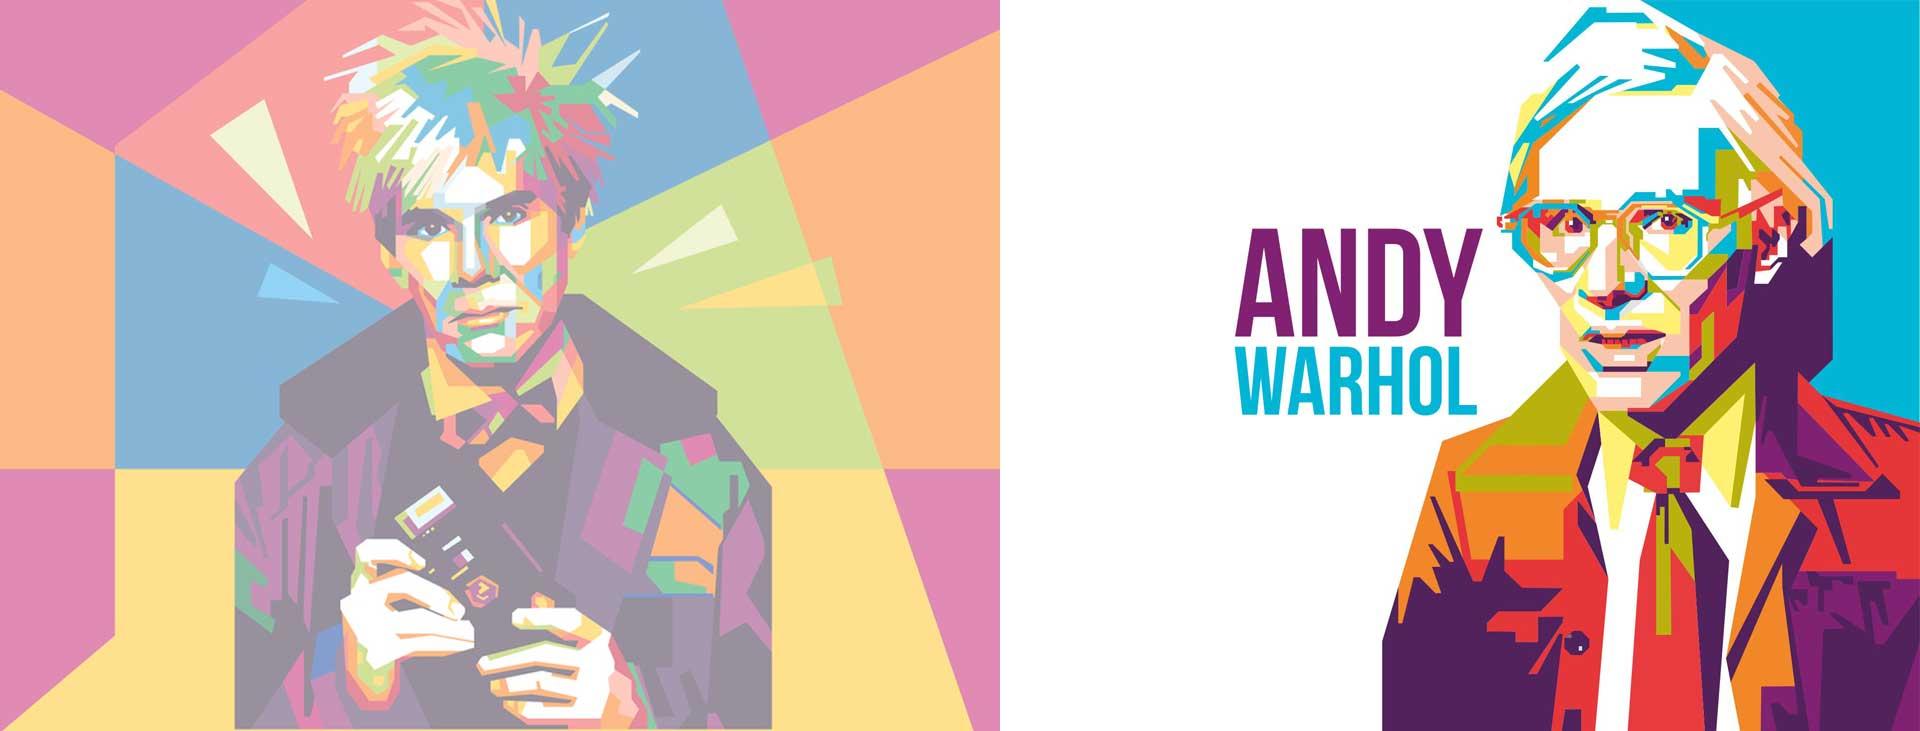 Andy Warhol 2 - اندی وارهول Andy Warhol